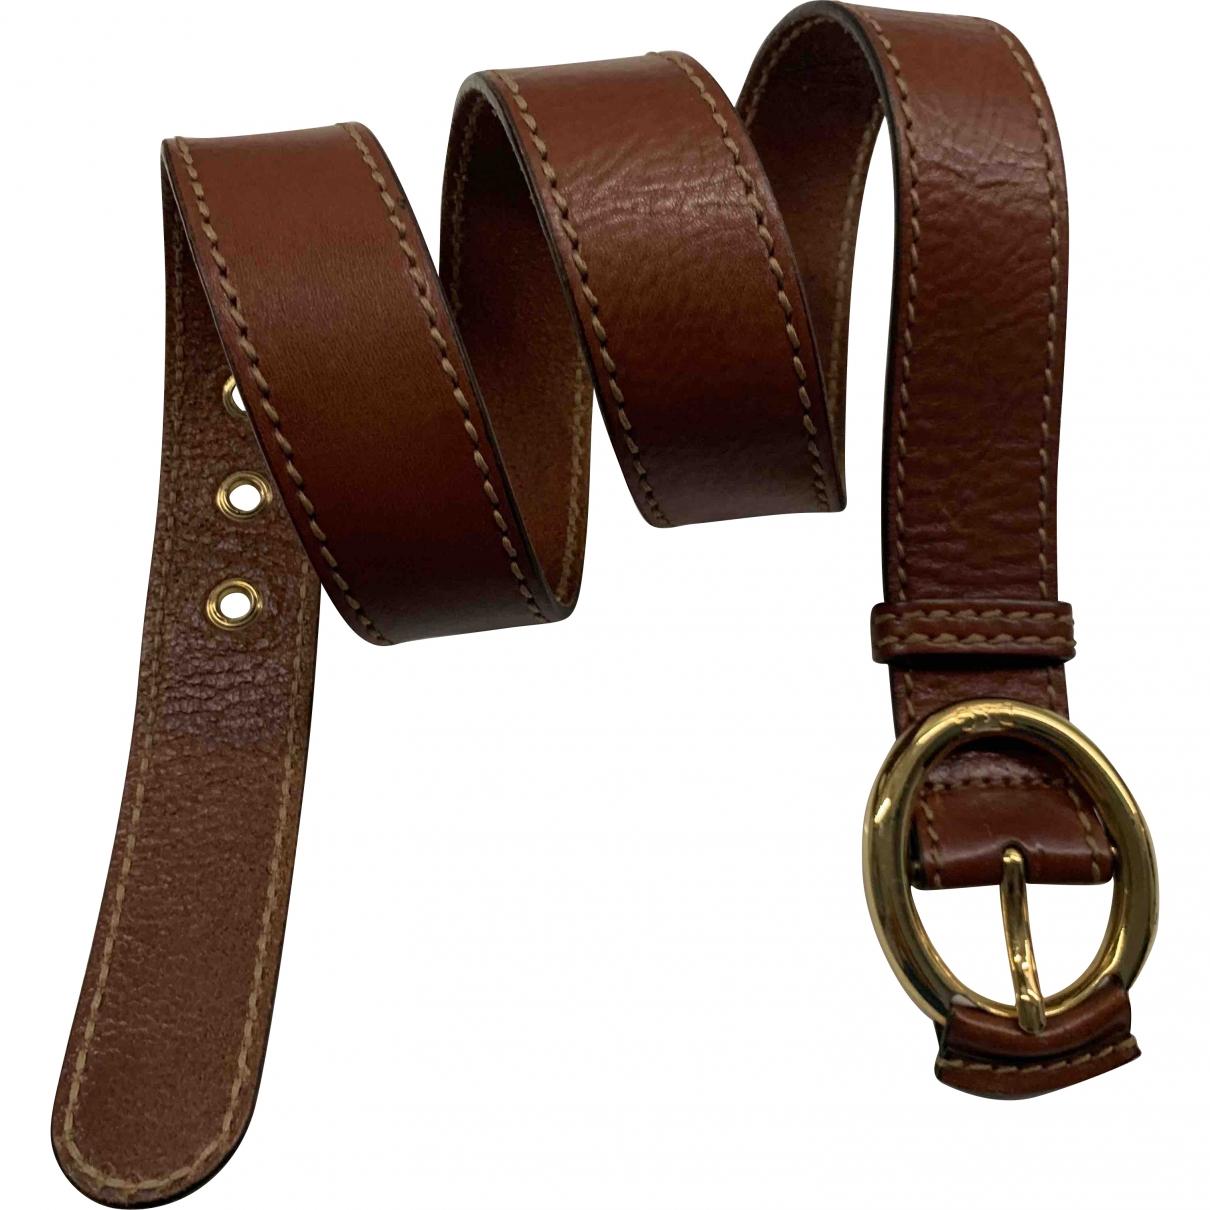 D&g \N Brown Leather belt for Women S International